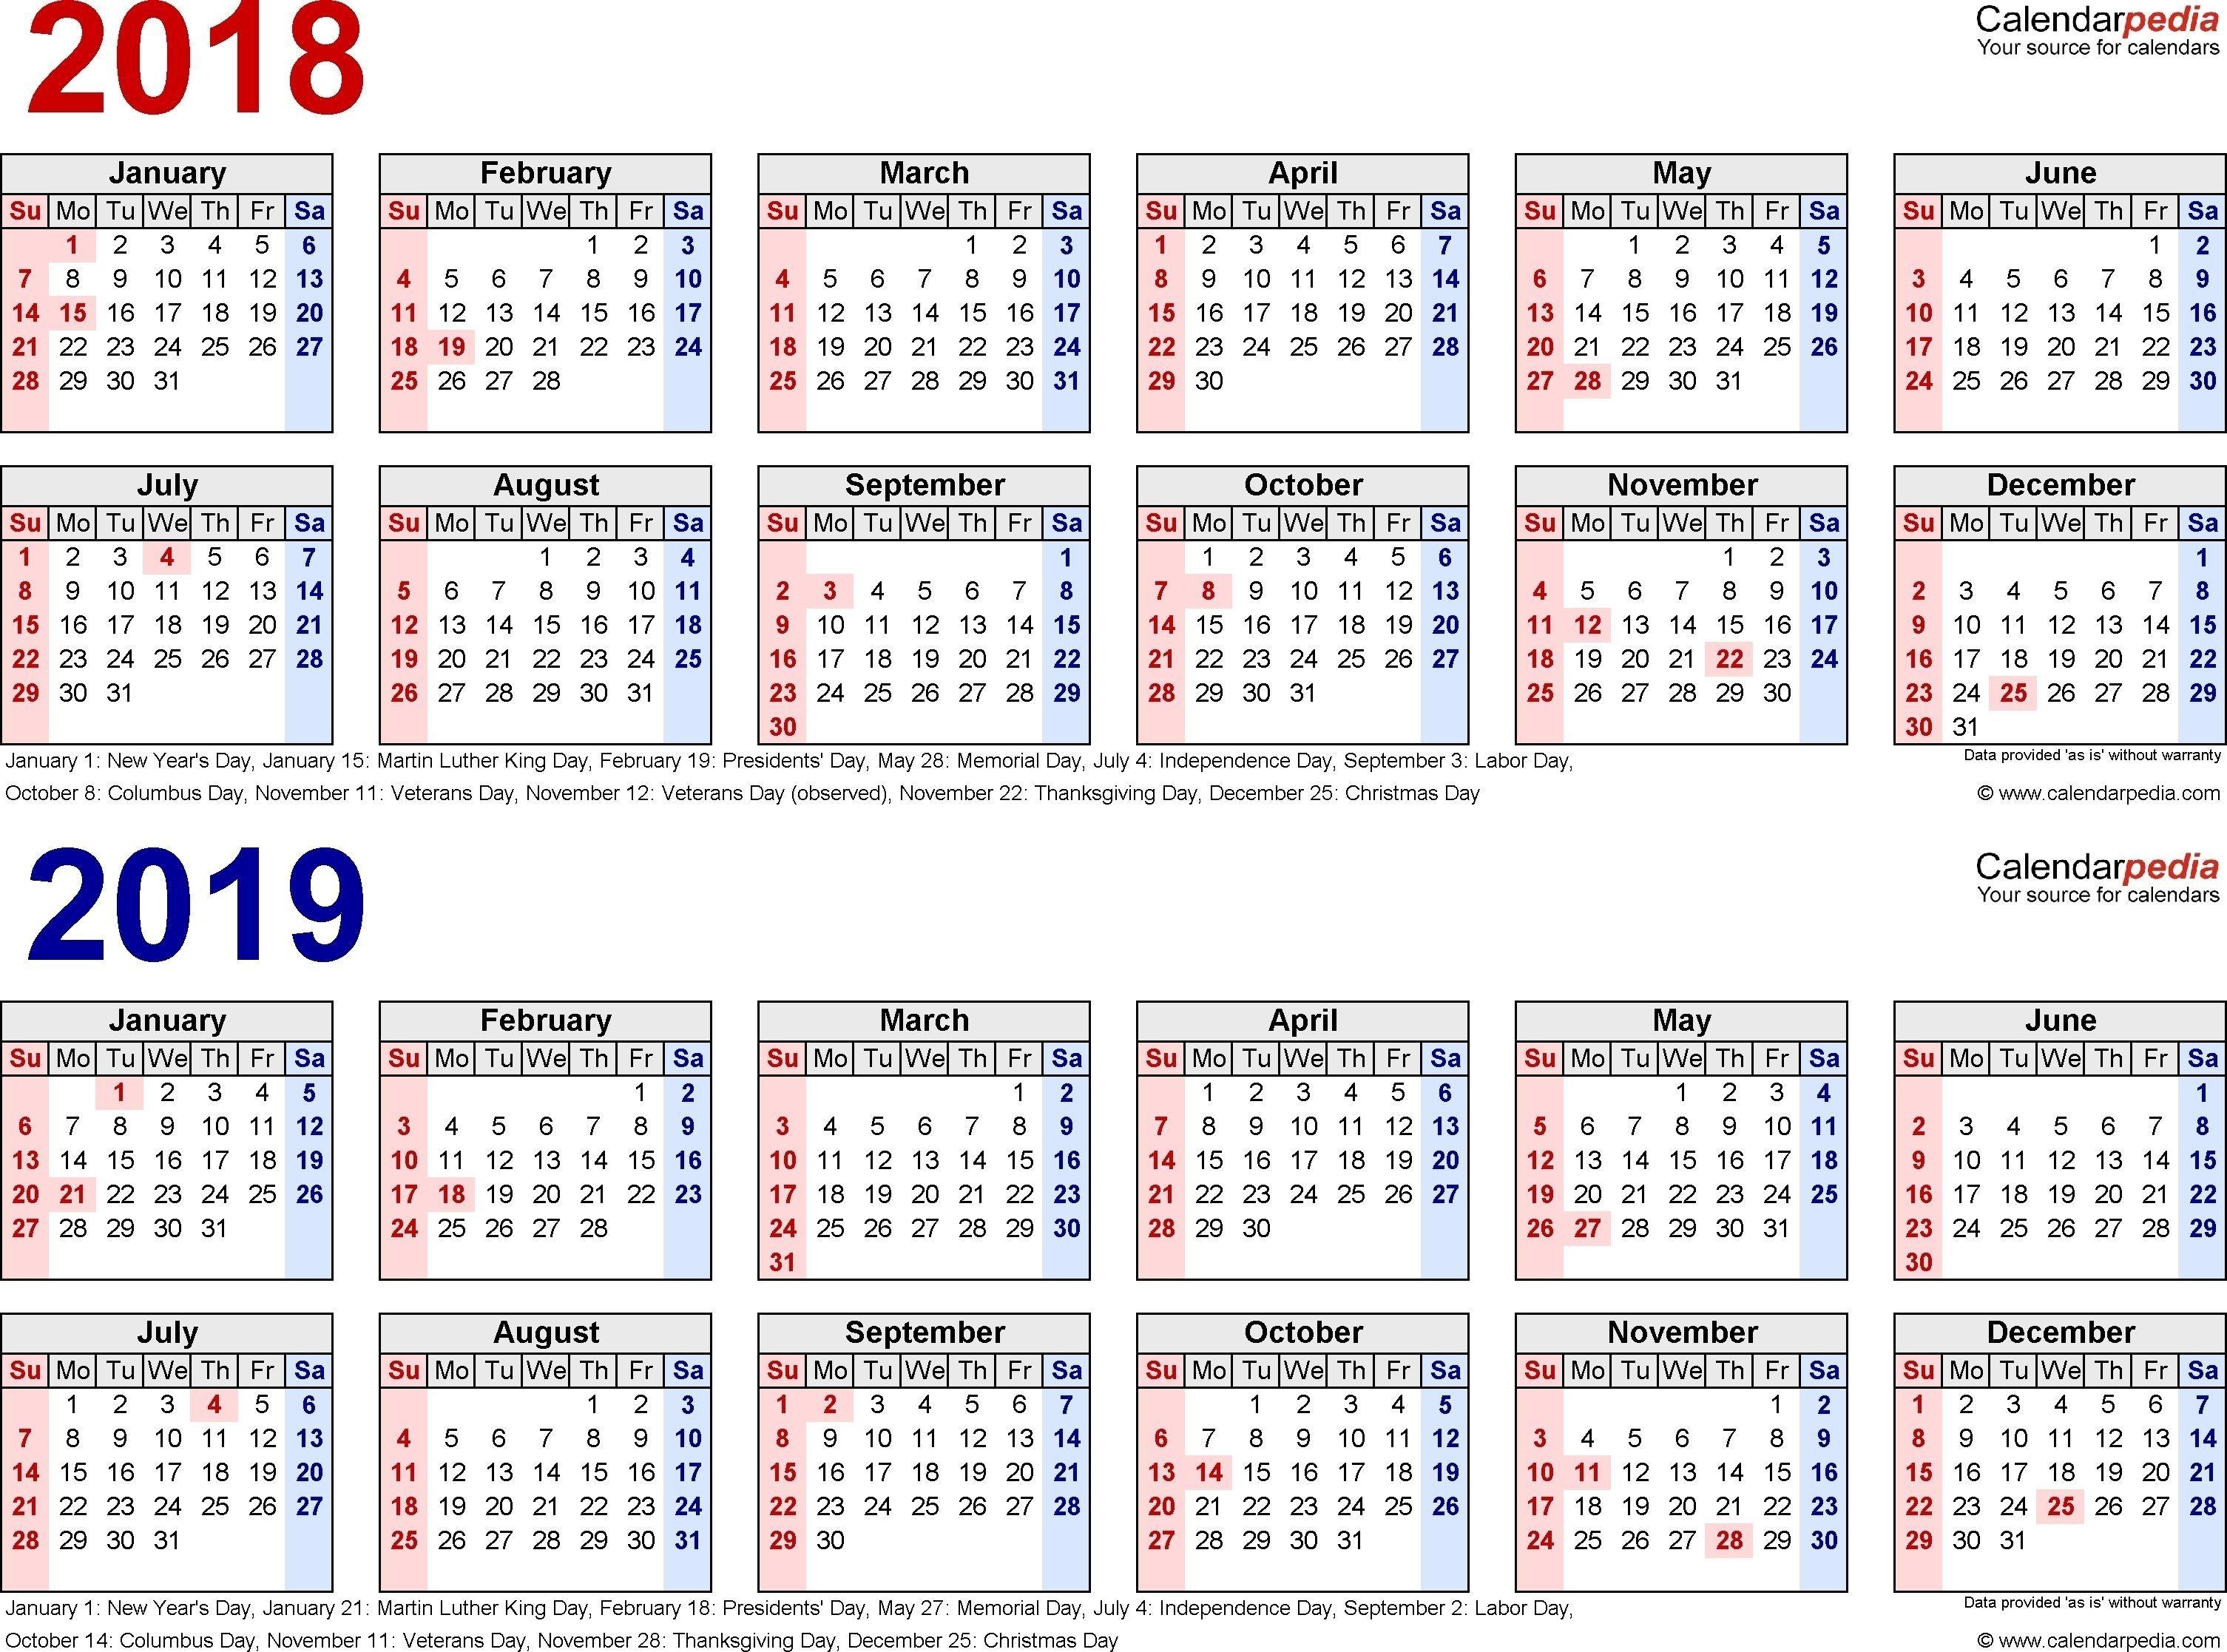 2019 Biweekly Payroll Calendar Template | Payroll Calendar